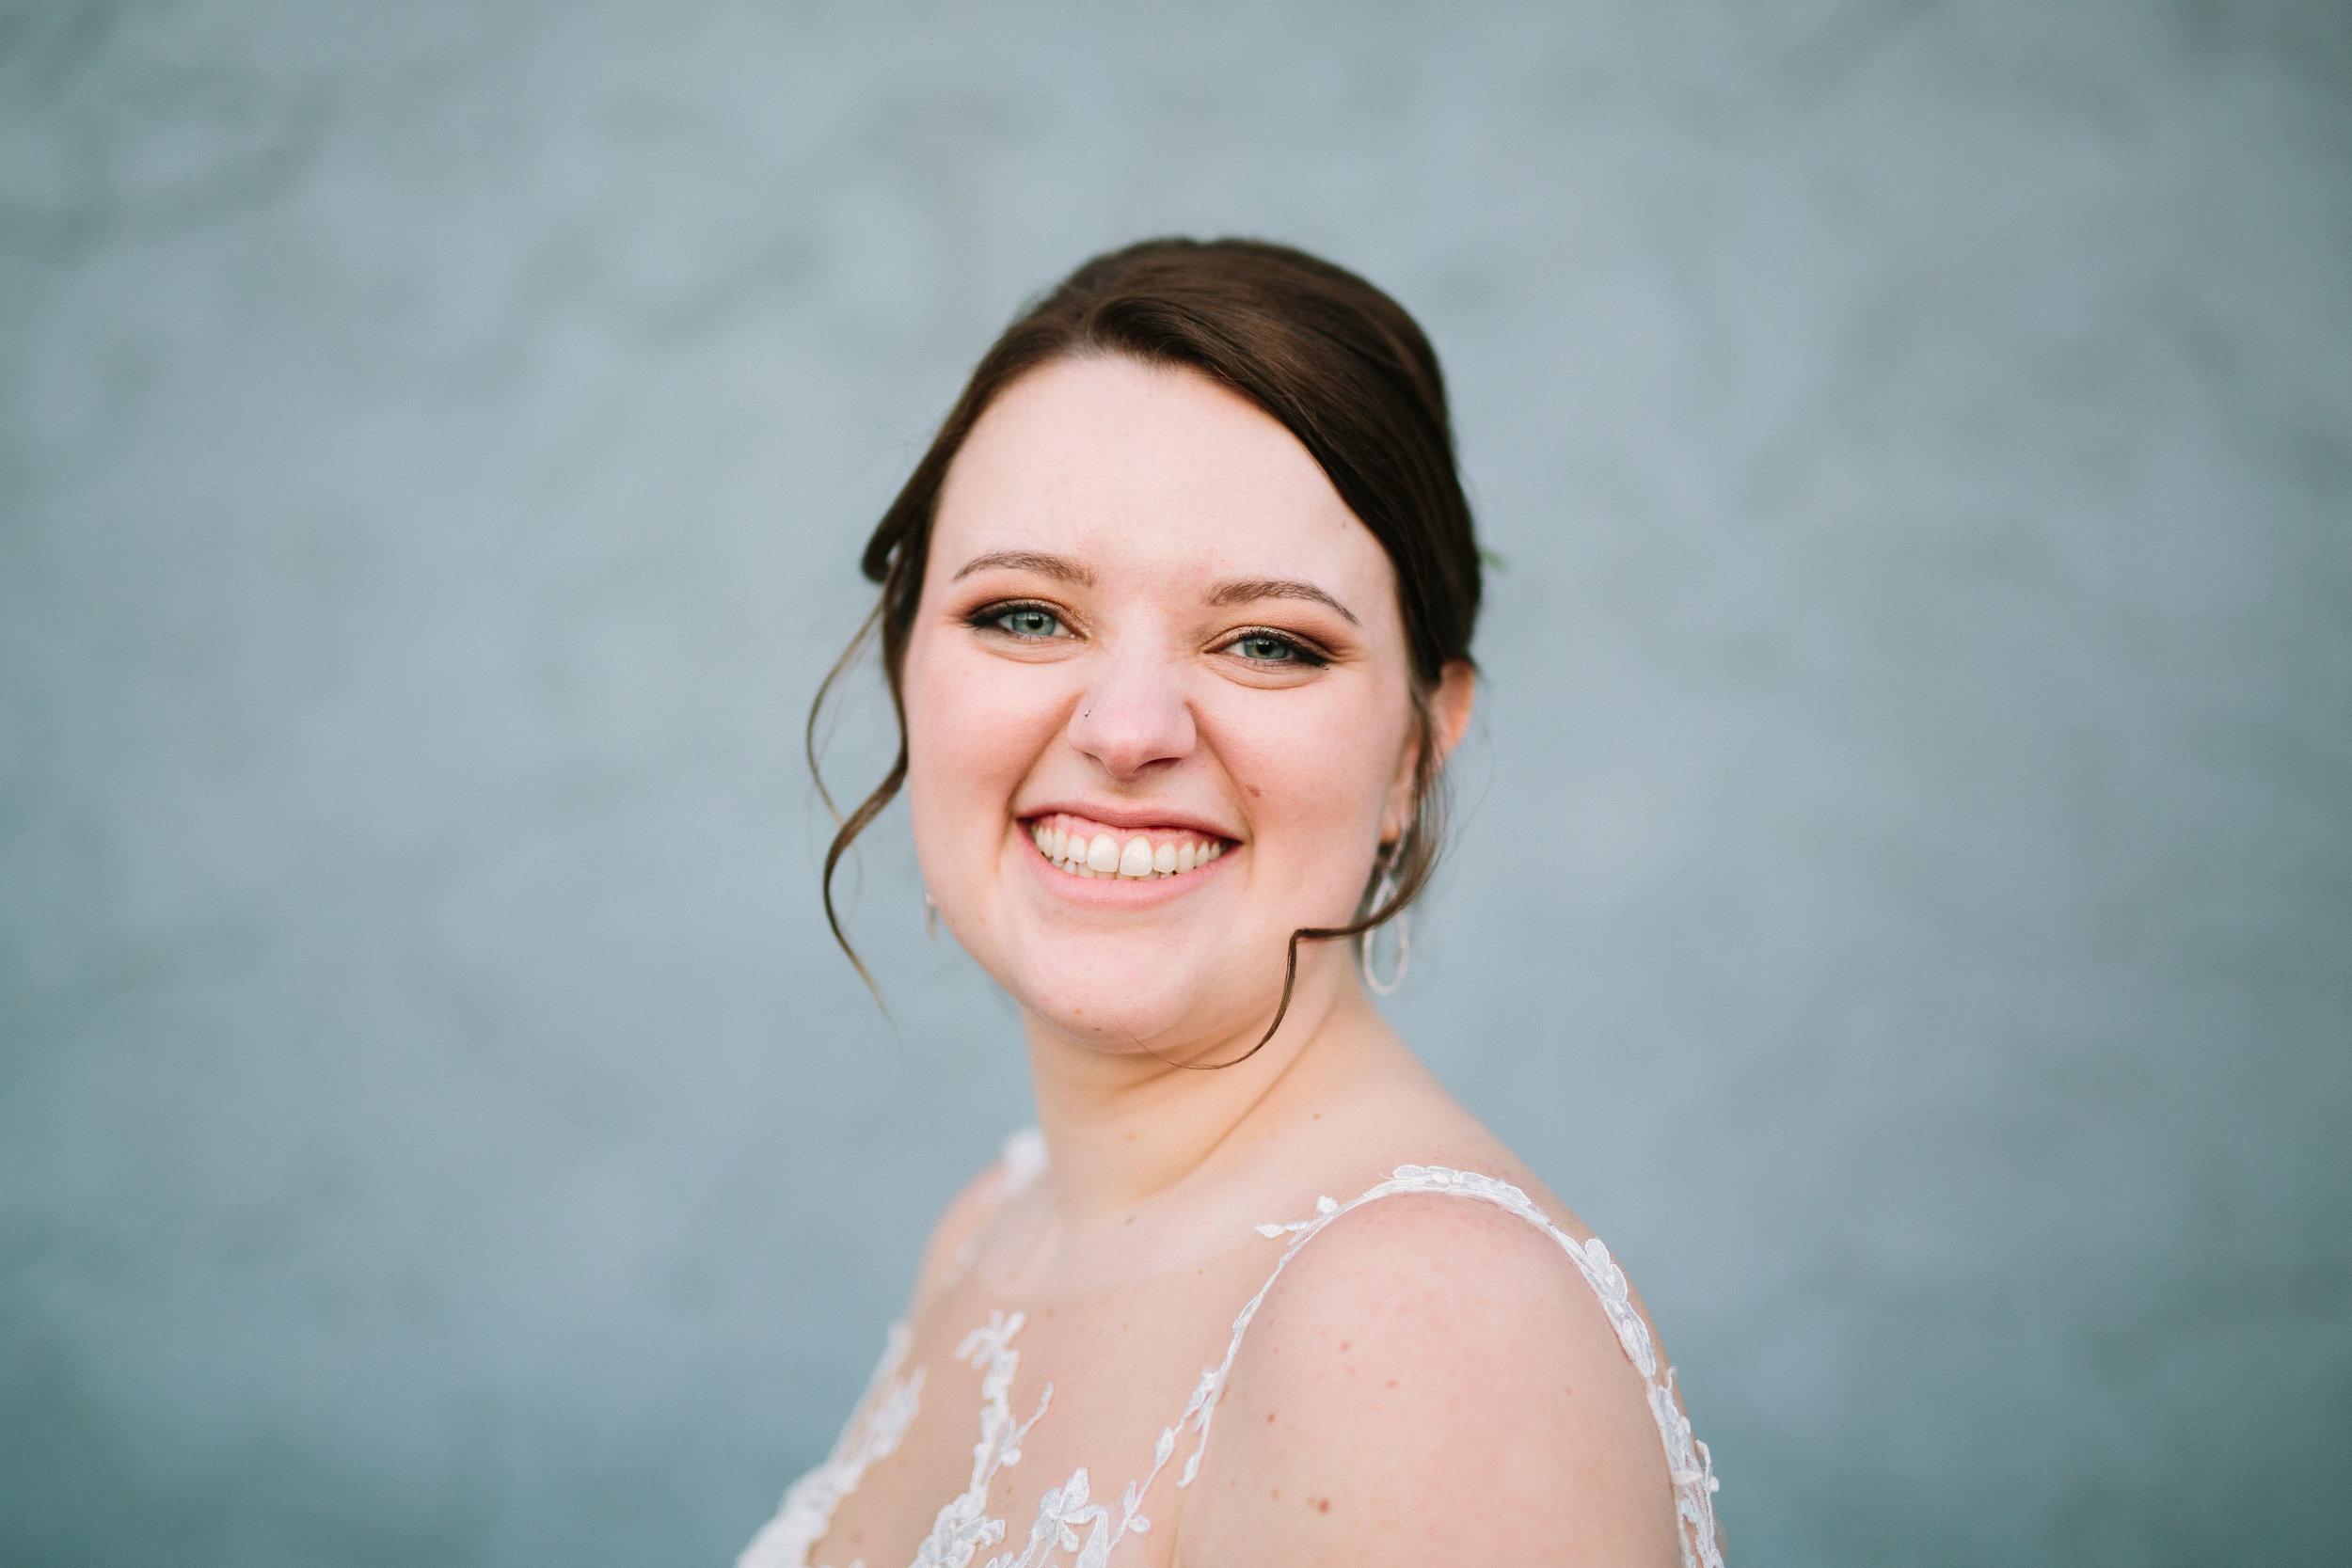 Fun Rustic spokane wedding curly hair laughing giggling against wall